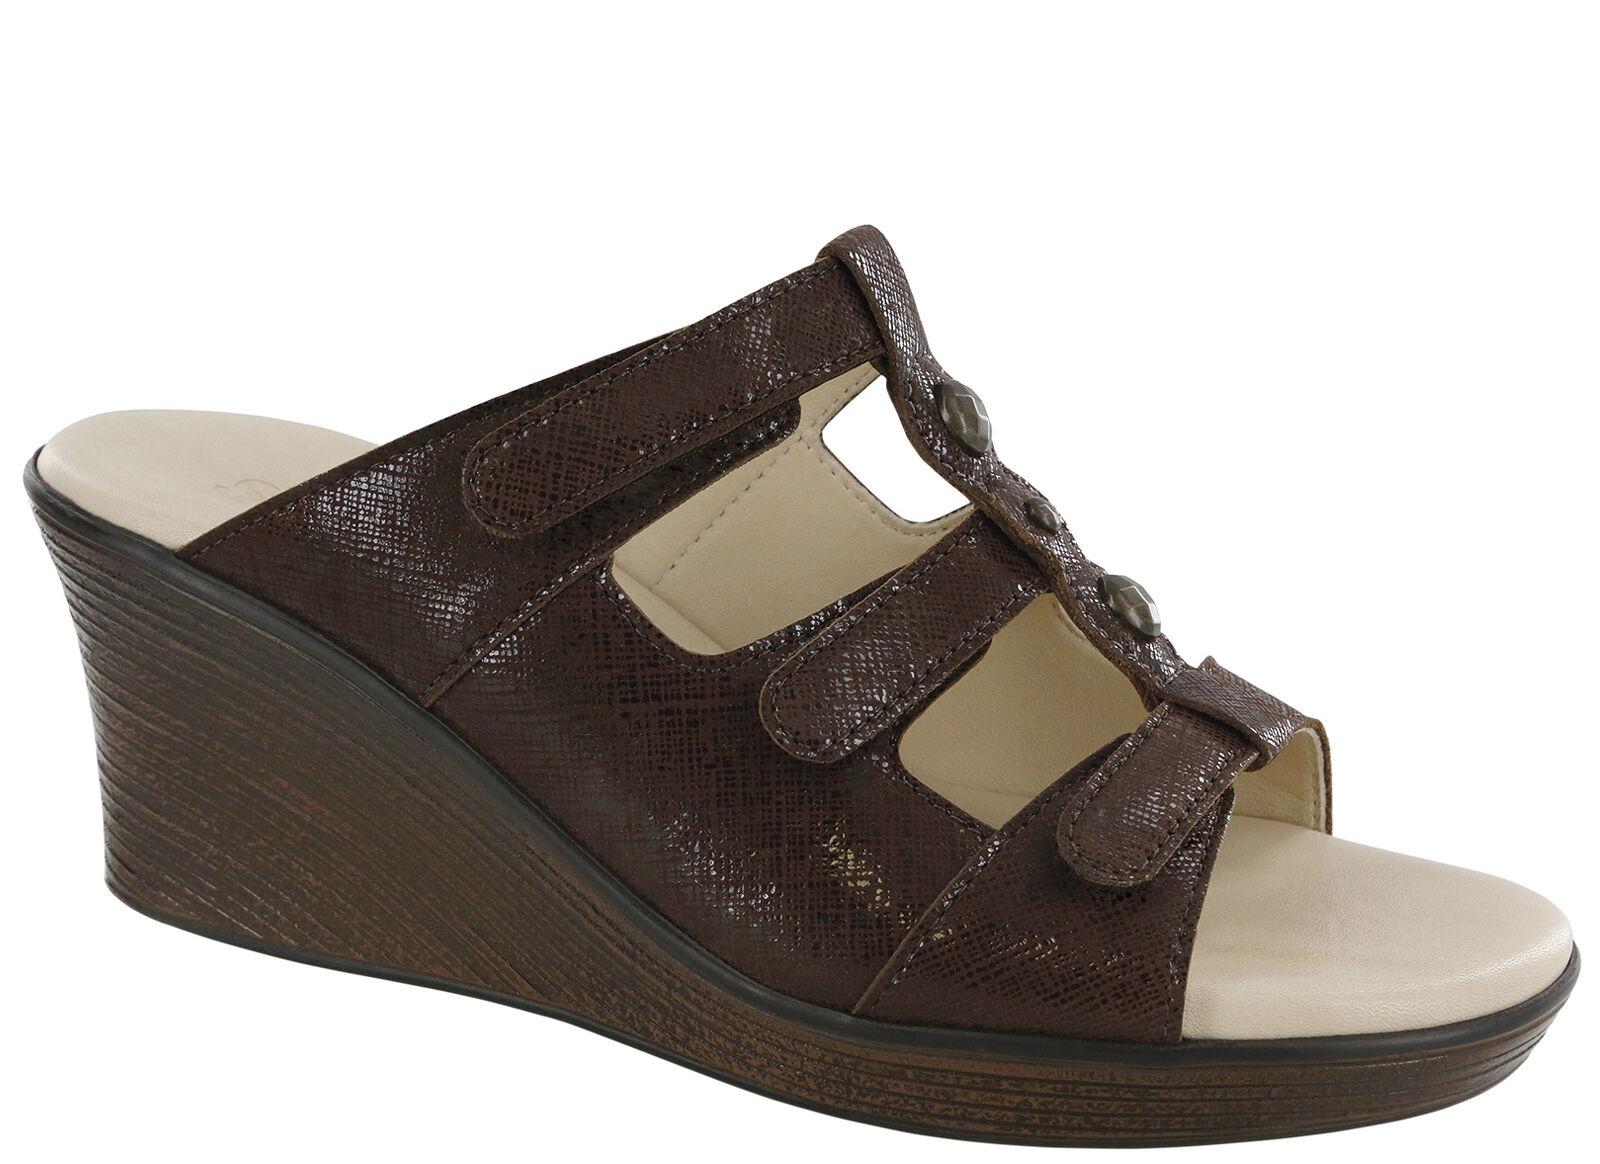 Ginger Wedge Sandal | SAS Shoes